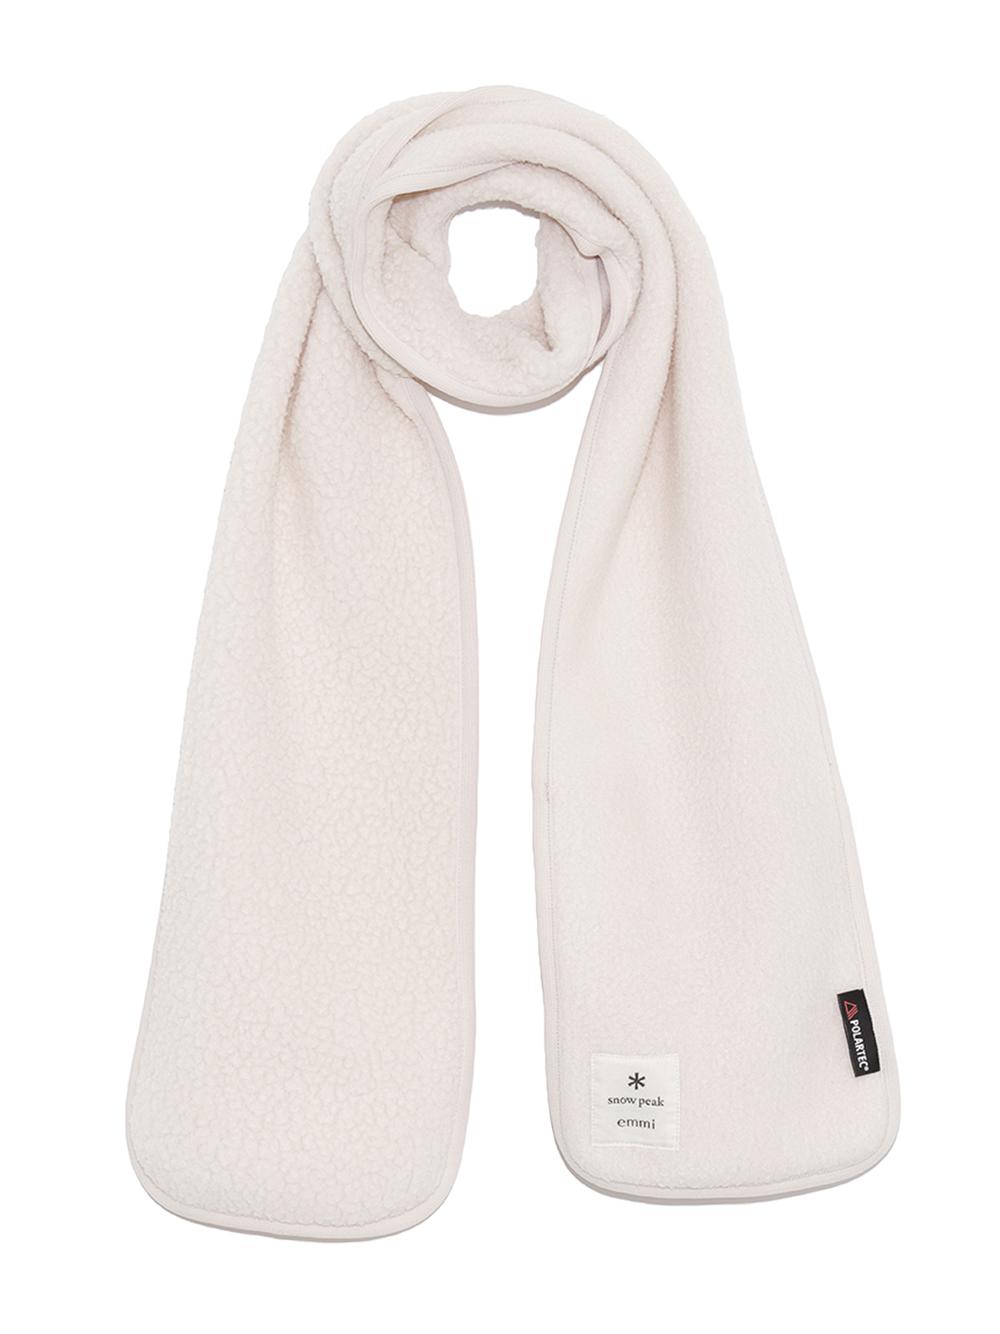 【emmi×Snowpeak】Thermal Boa Fleece Stole(BEG-F)